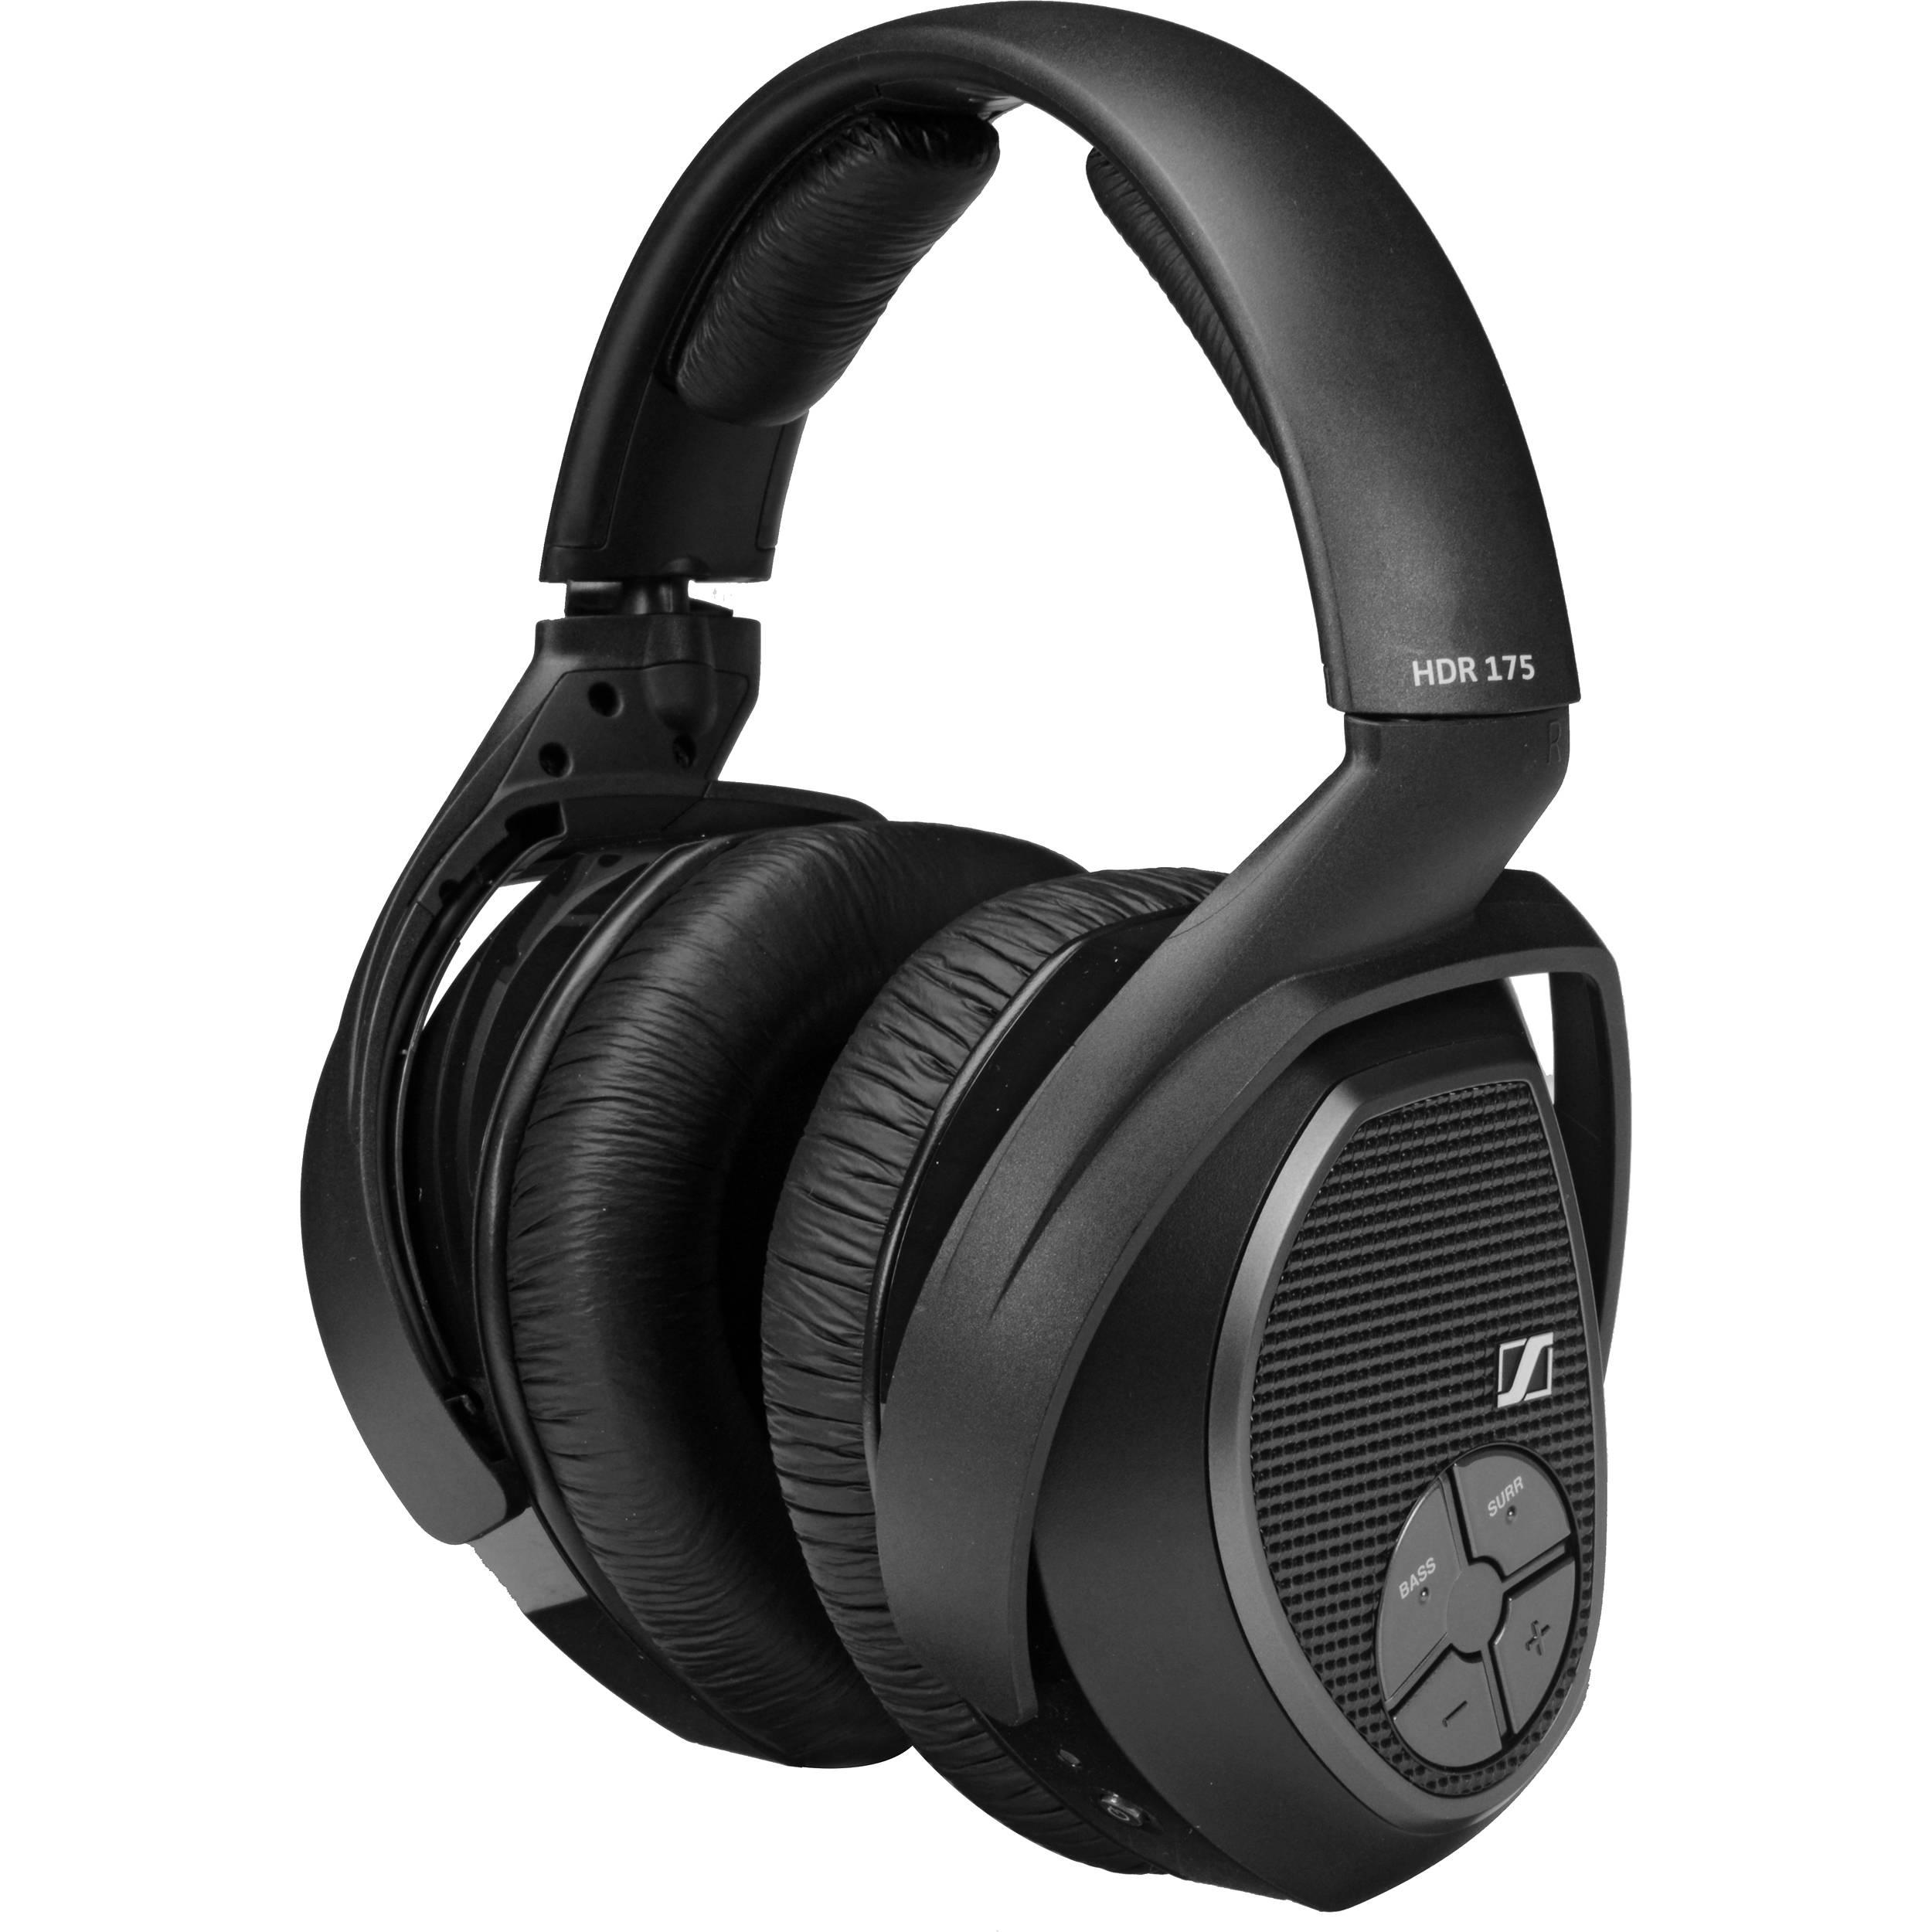 Sennheiser HDR 175 Headset for RS 175 System 505582 B&H Photo